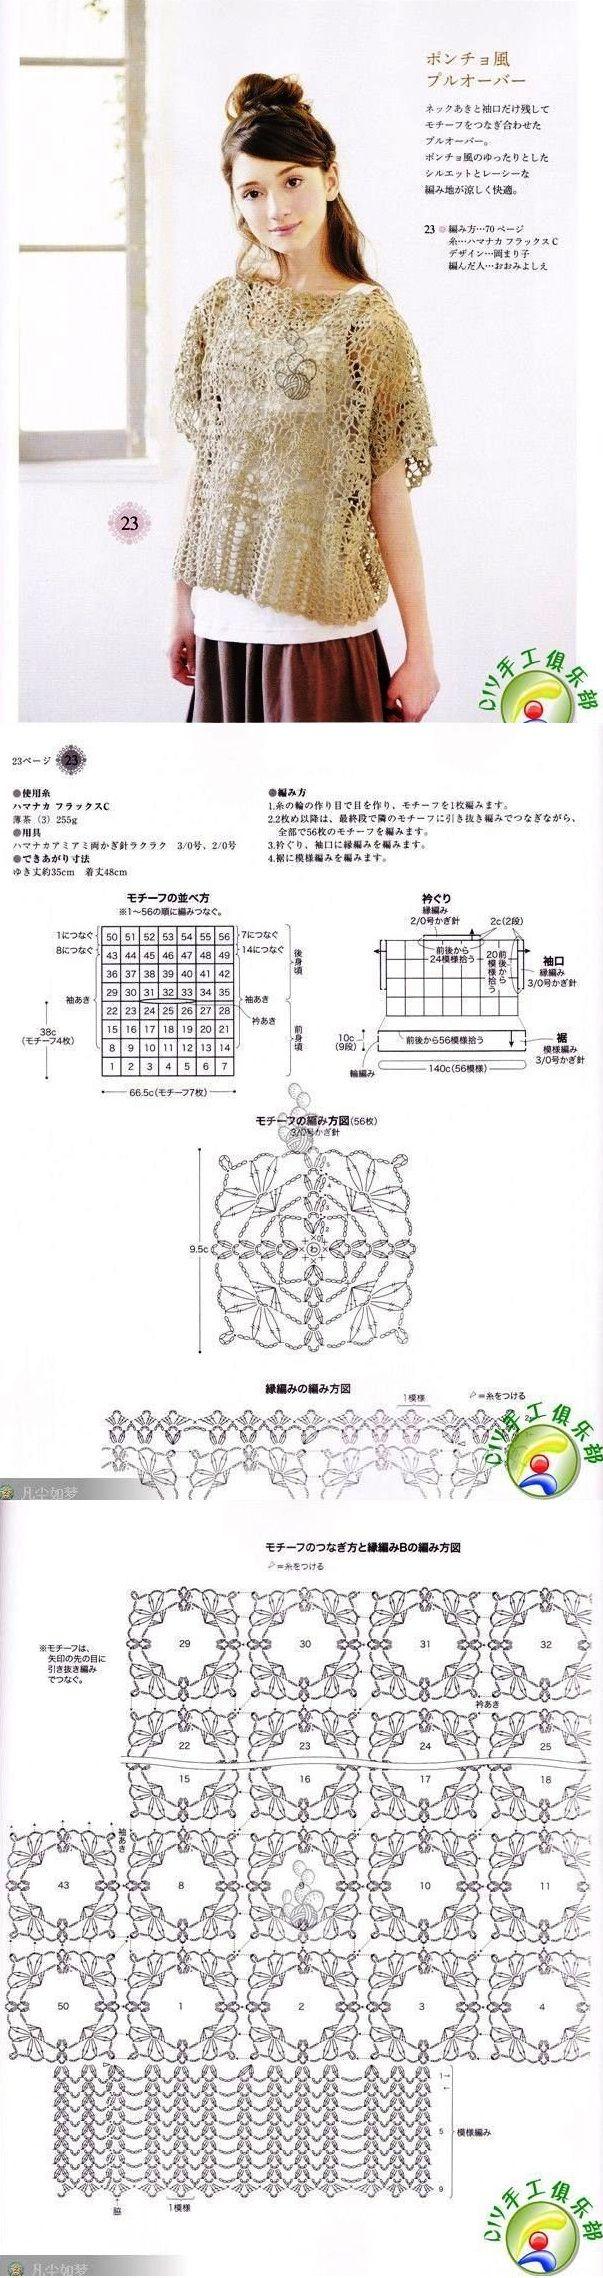 Stitch crochet pattern unit for women